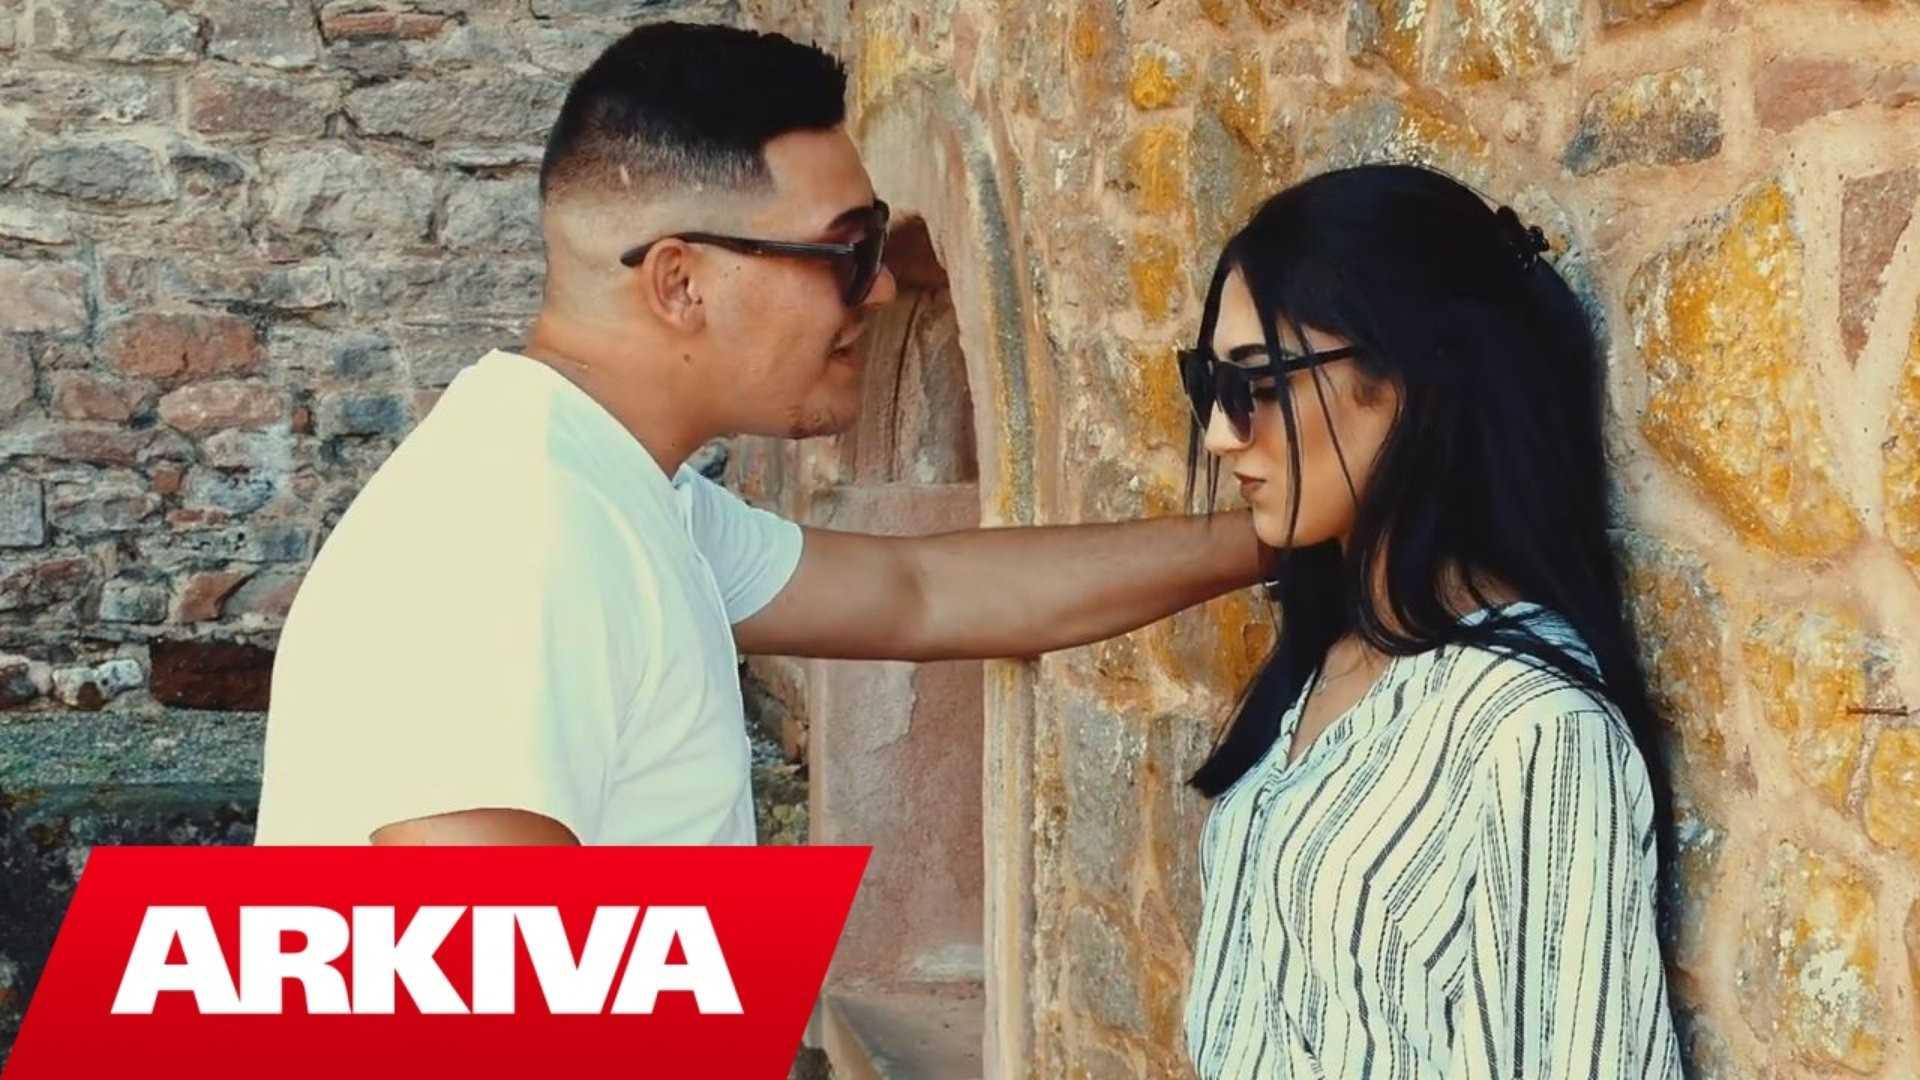 Top Albania dating incontri gratuiti in Kumasi